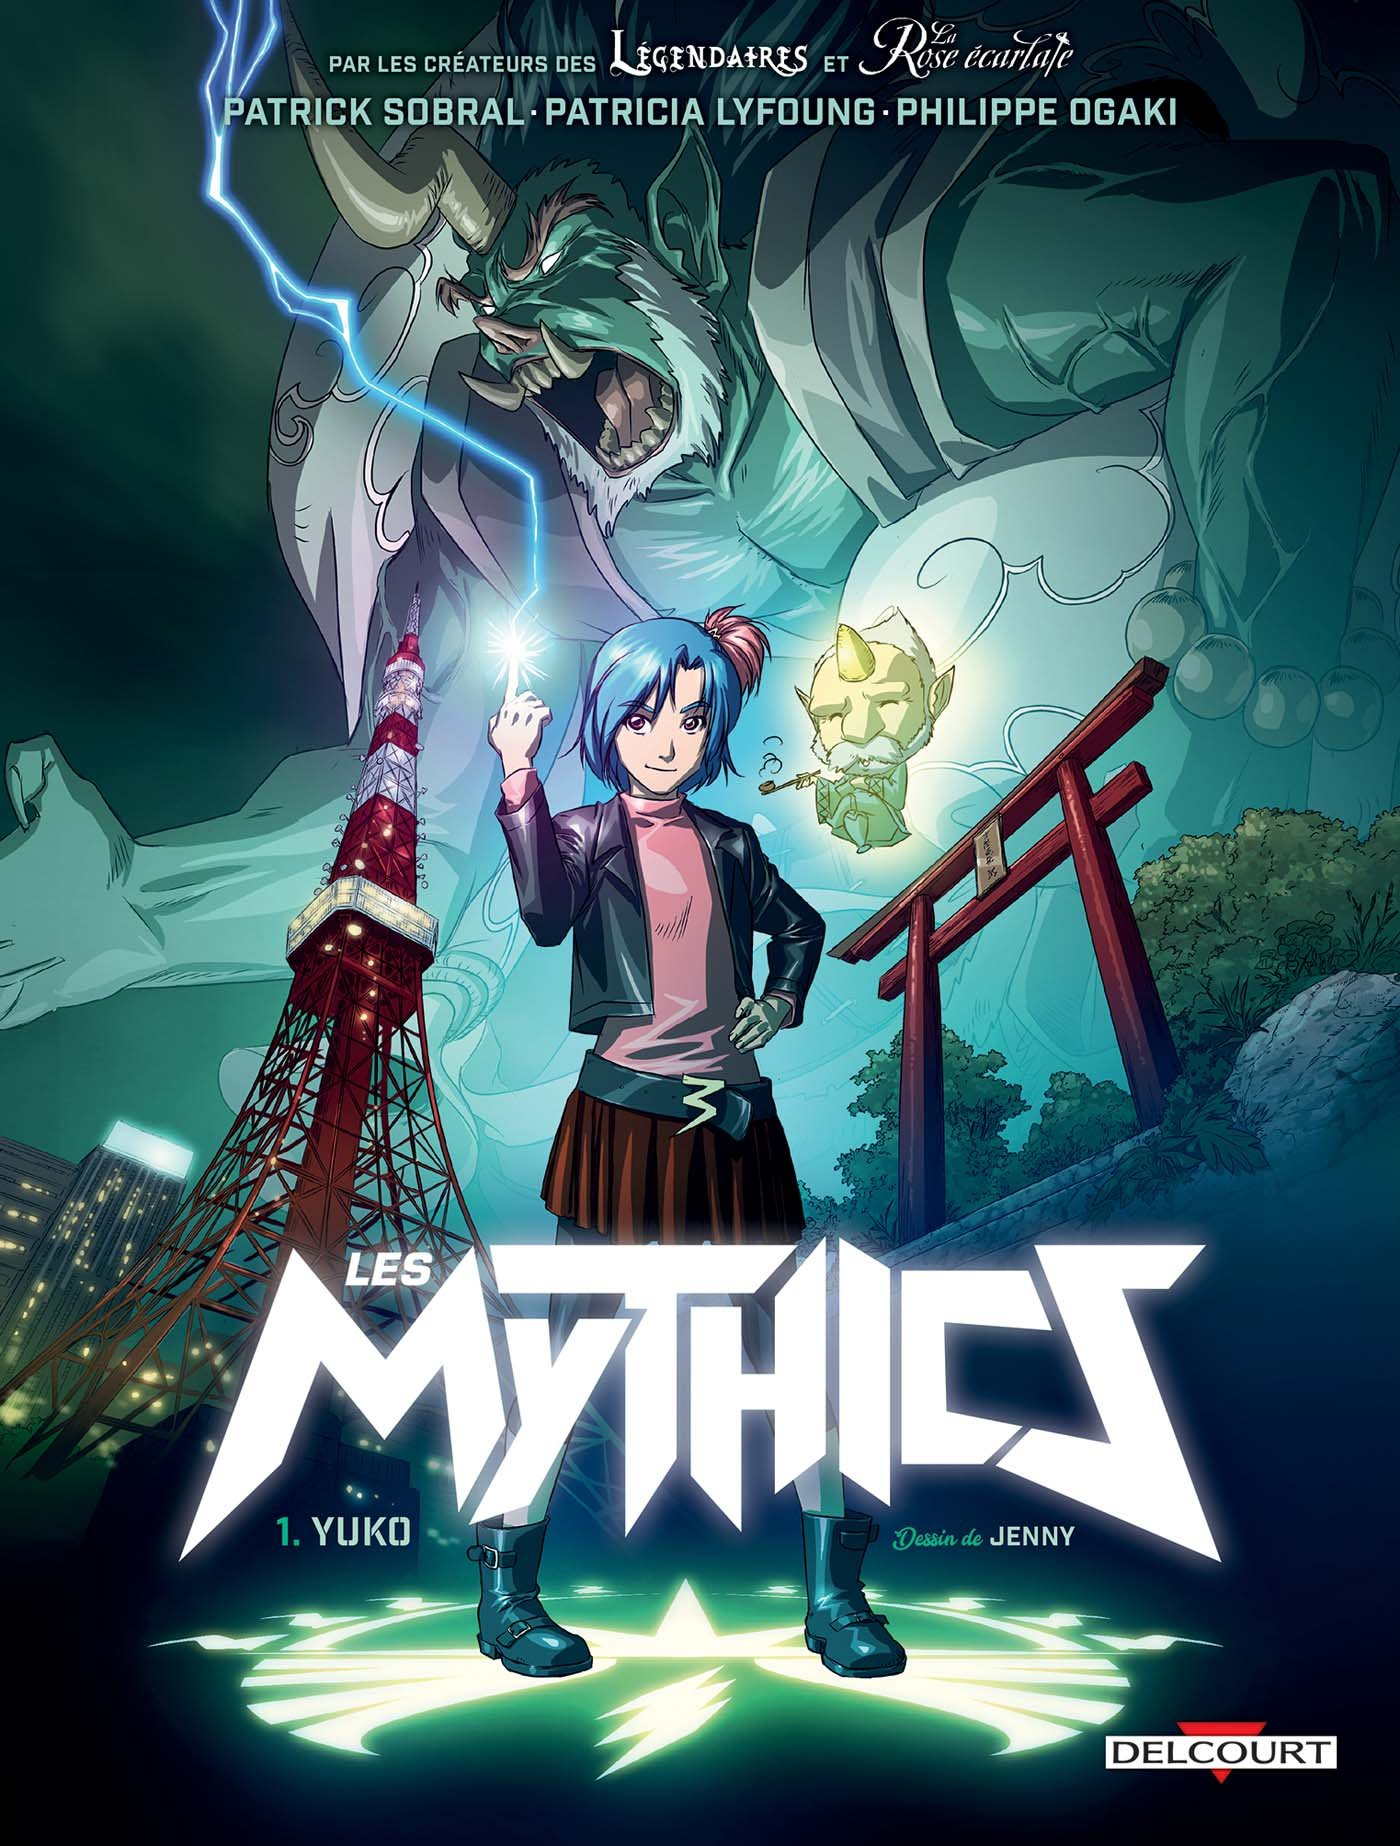 Les Mythics 1 - Yuko